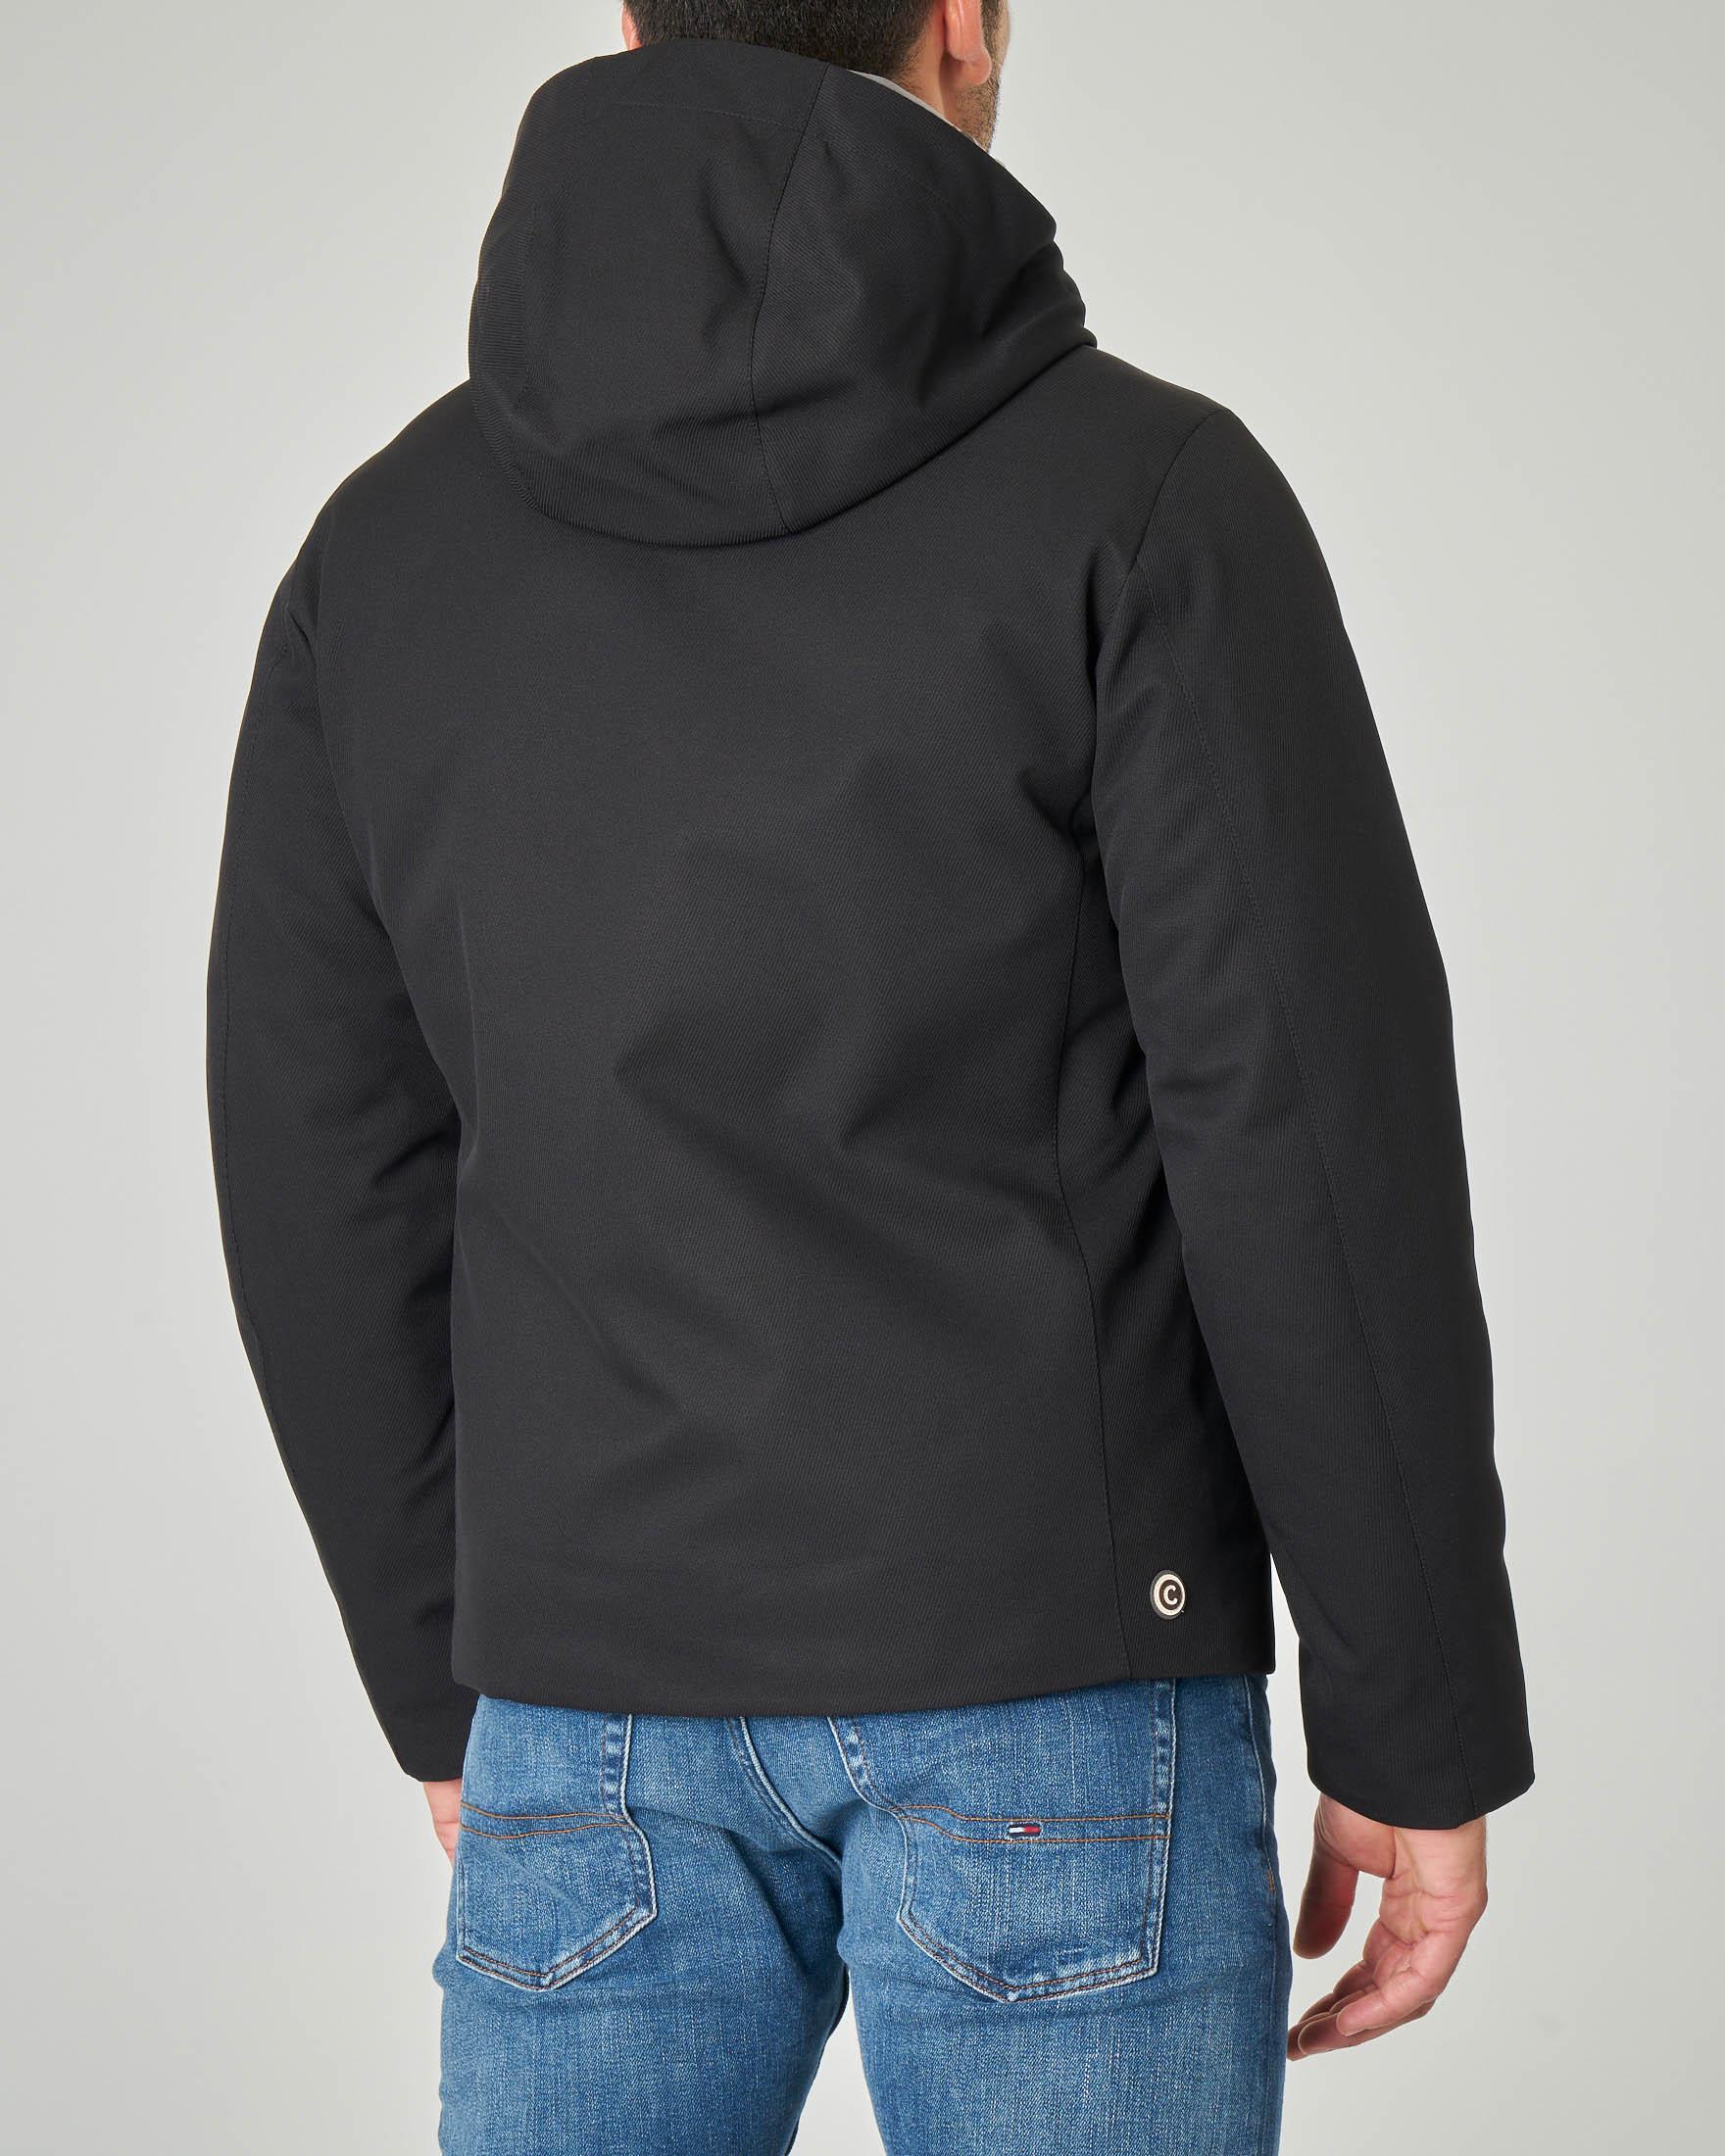 Colmar originals giacca effetto lana imbottita in piuma blu